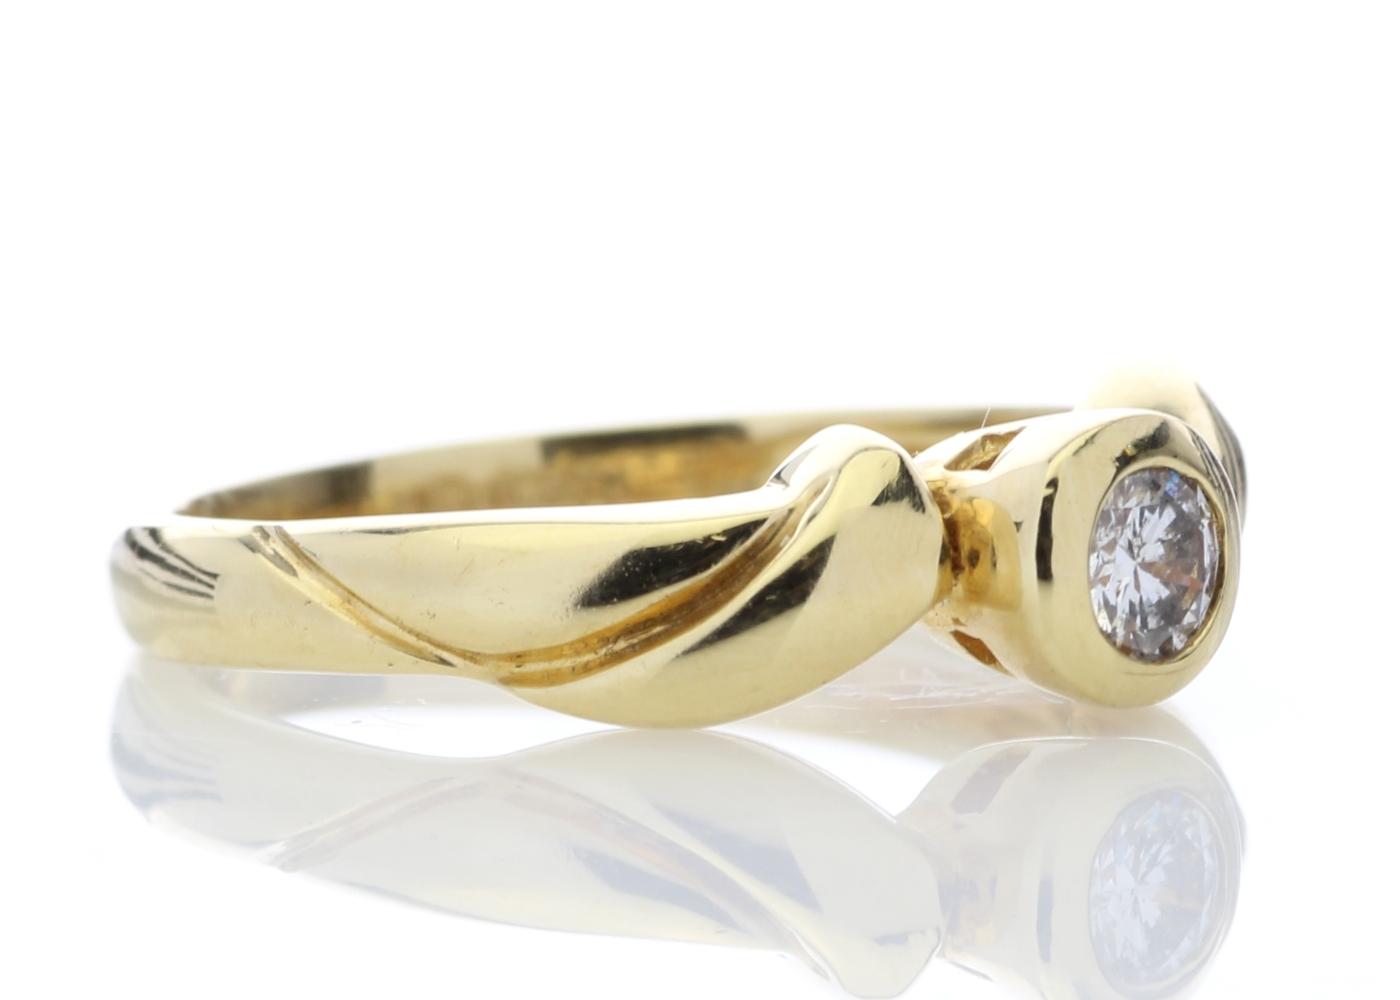 18ct Rub Over Set Diamond Ring 0.17 Carats - Image 4 of 7